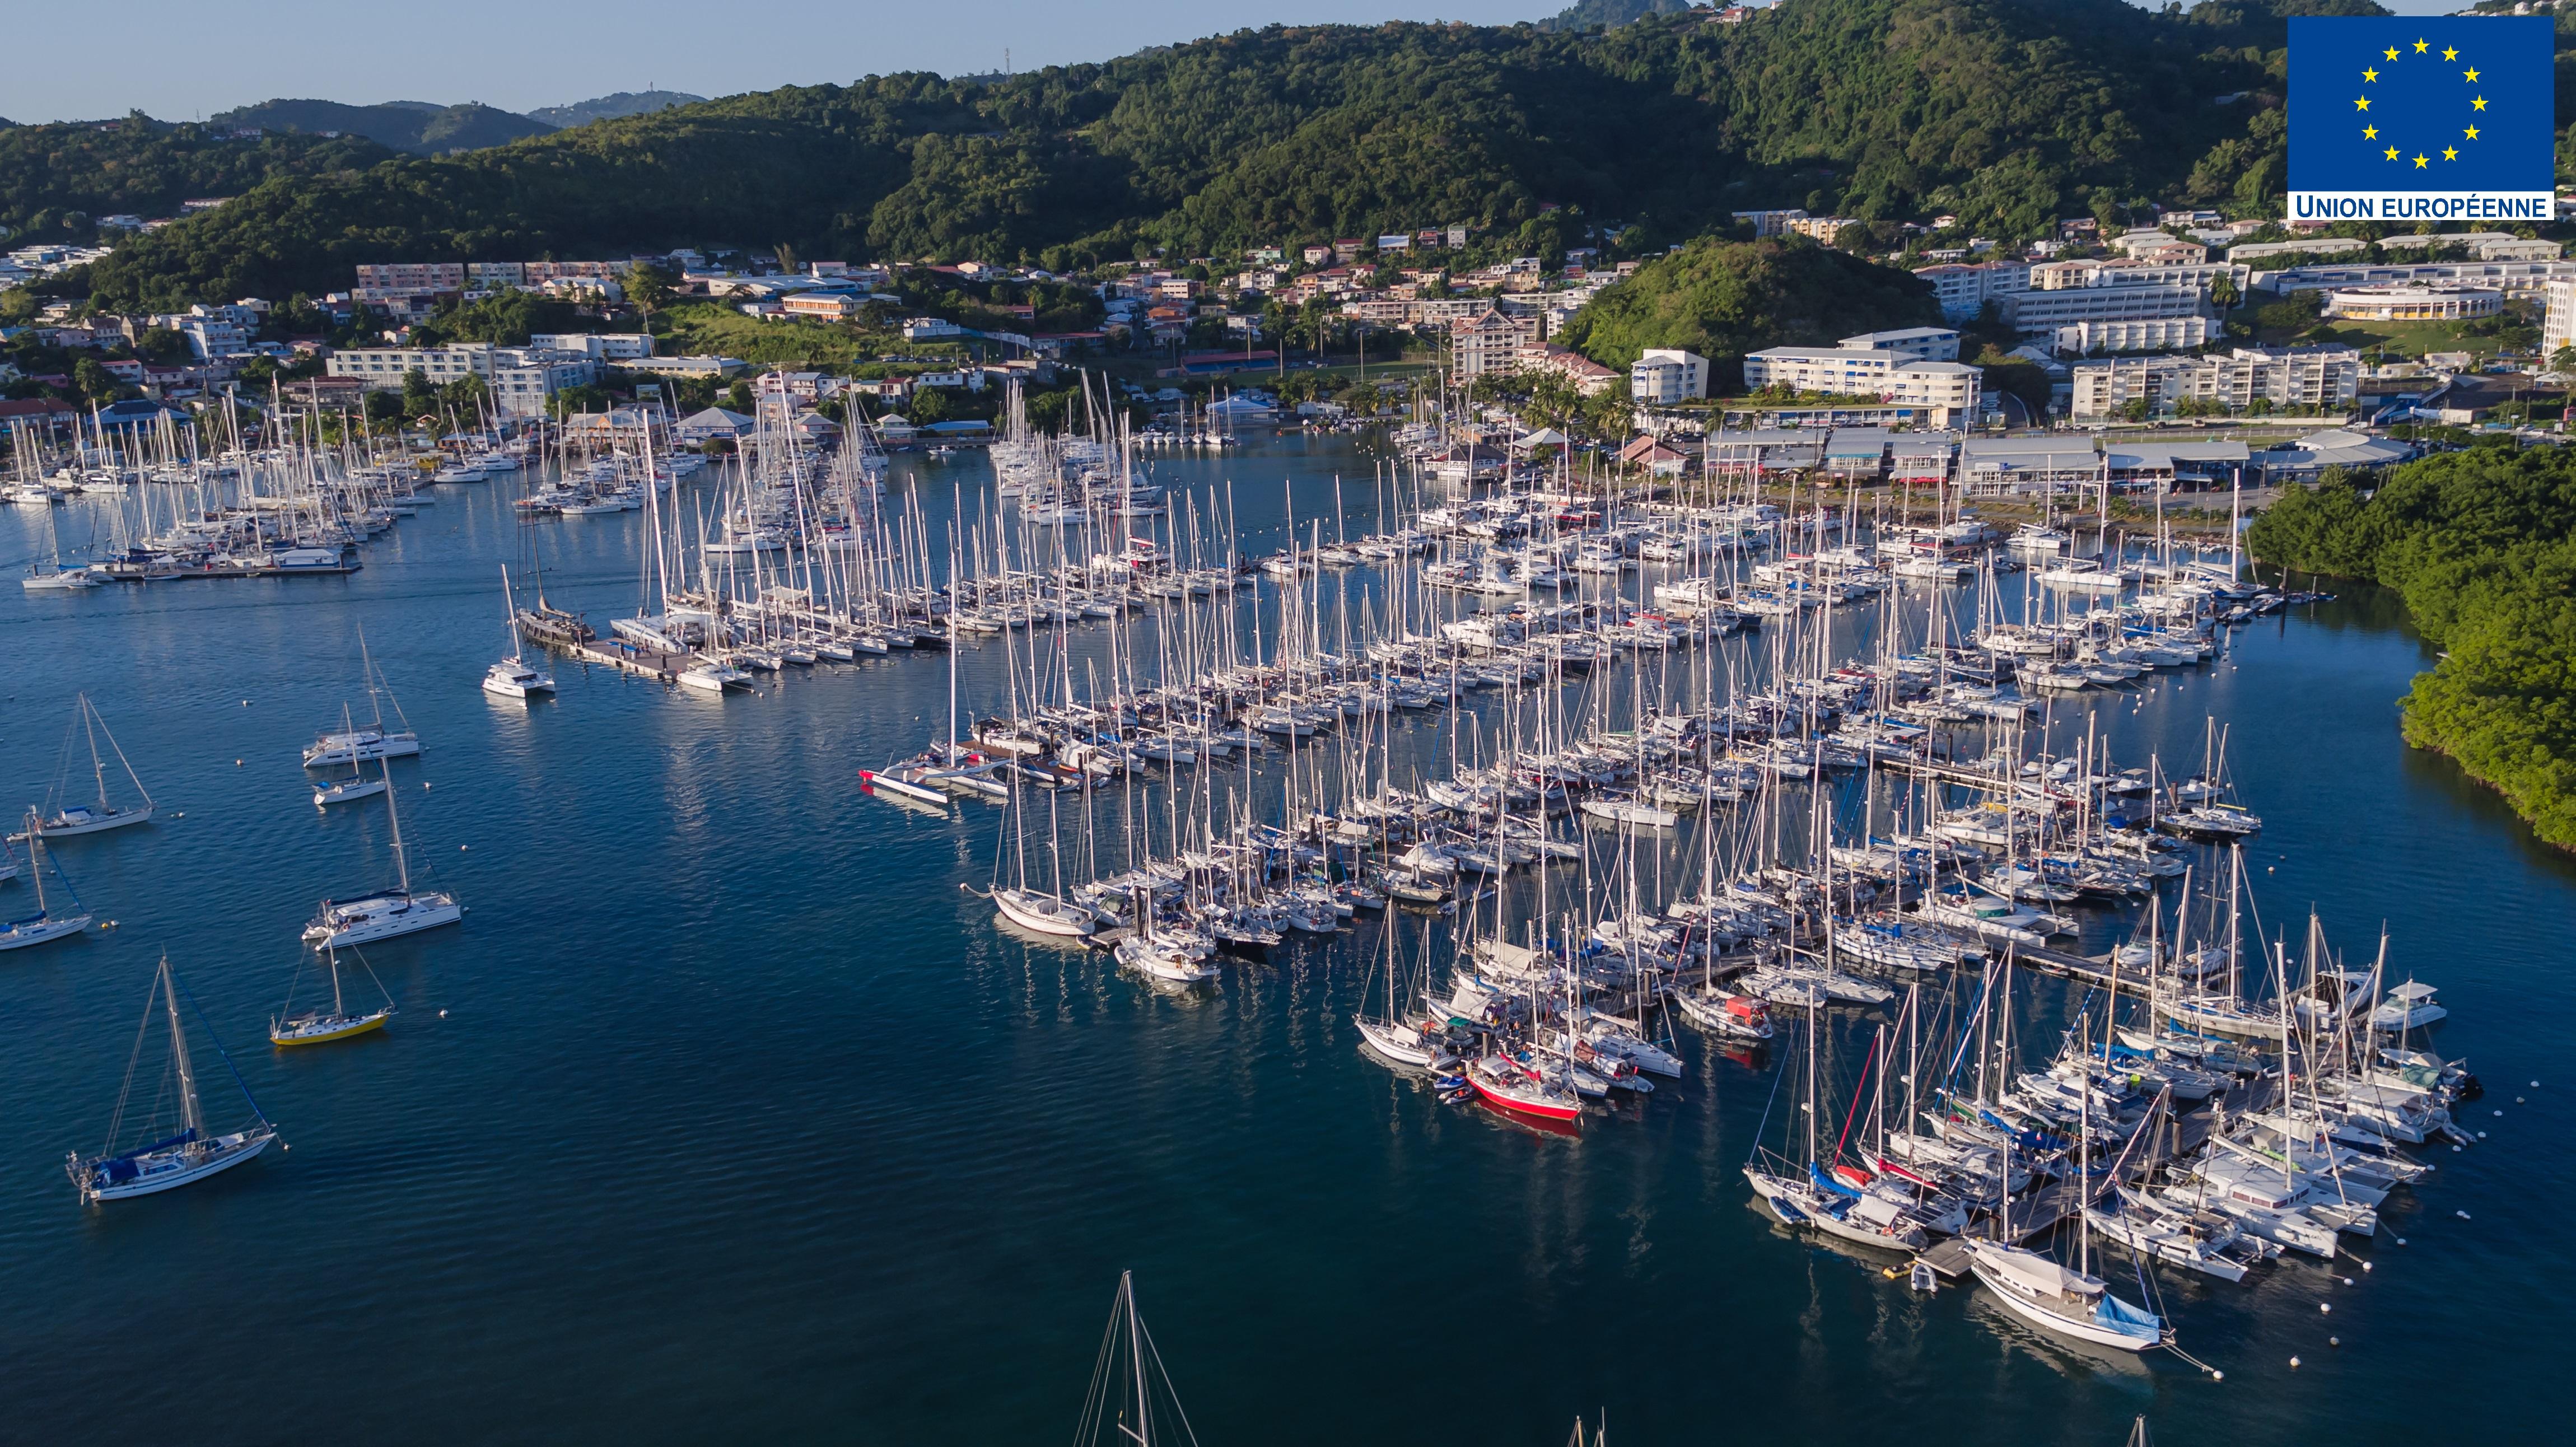 Marina du Marin - The Port of Martinique